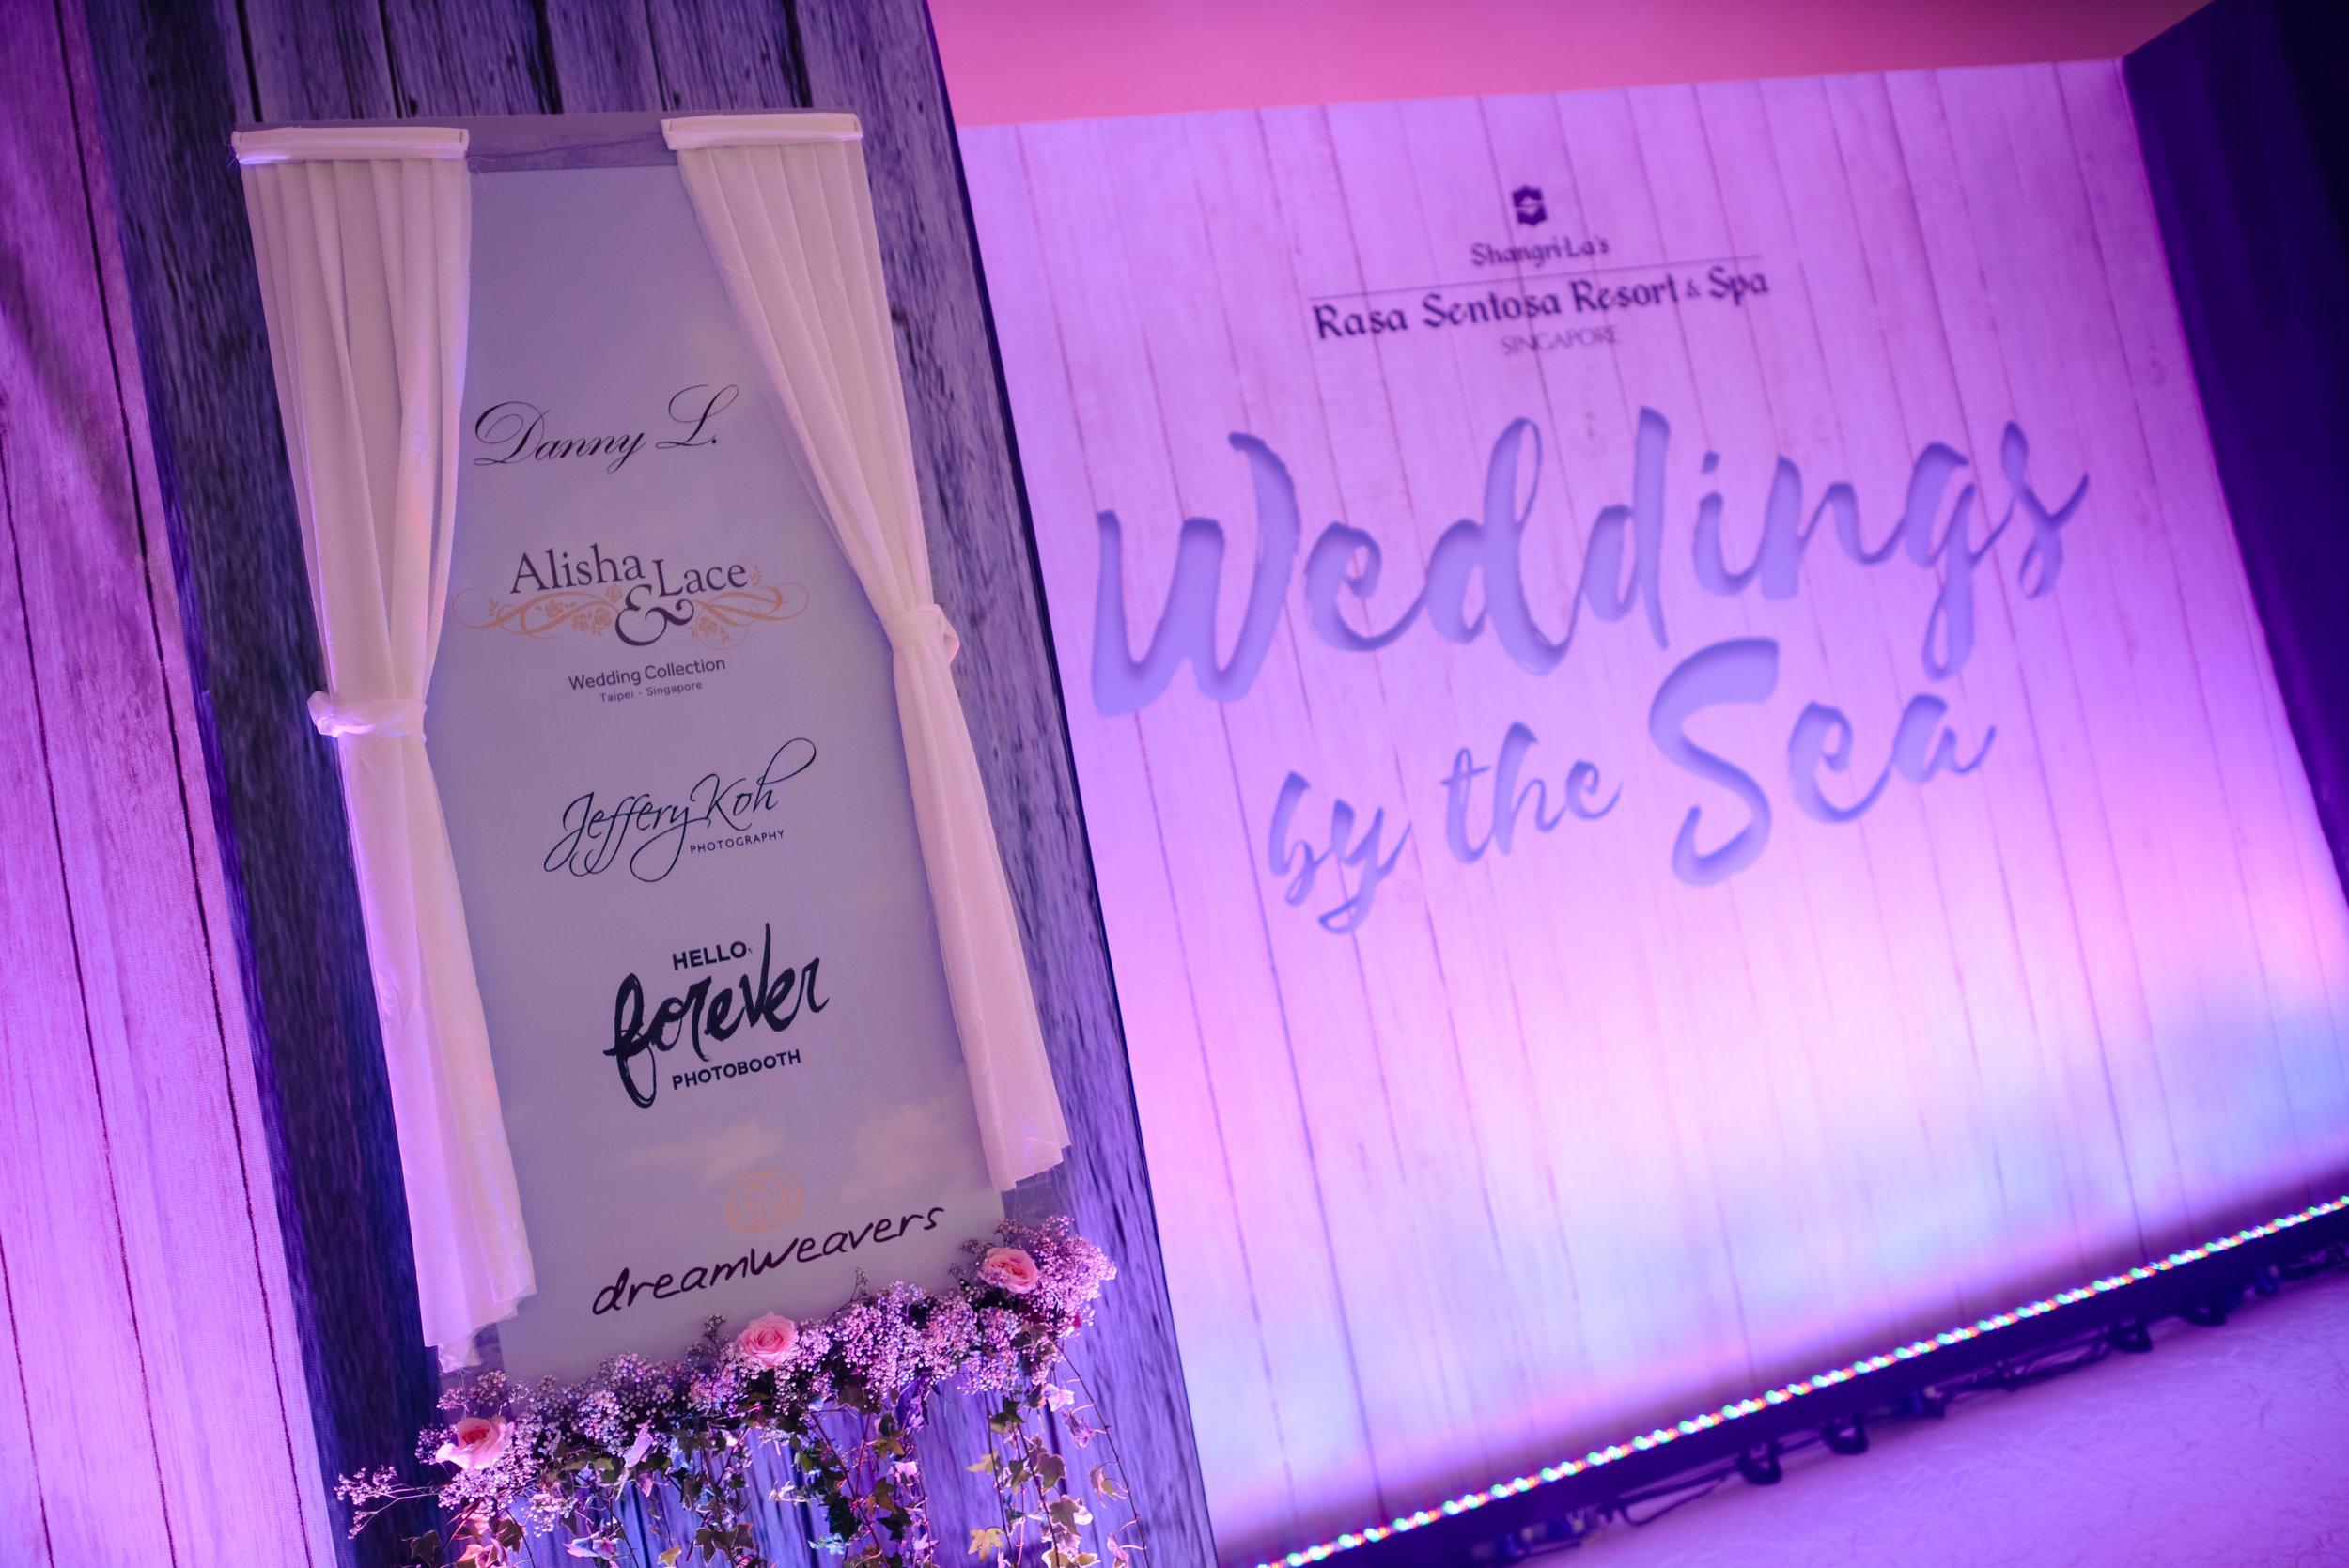 Shangri-La's  Rasa Sentosa Resort Wedding Show 2016